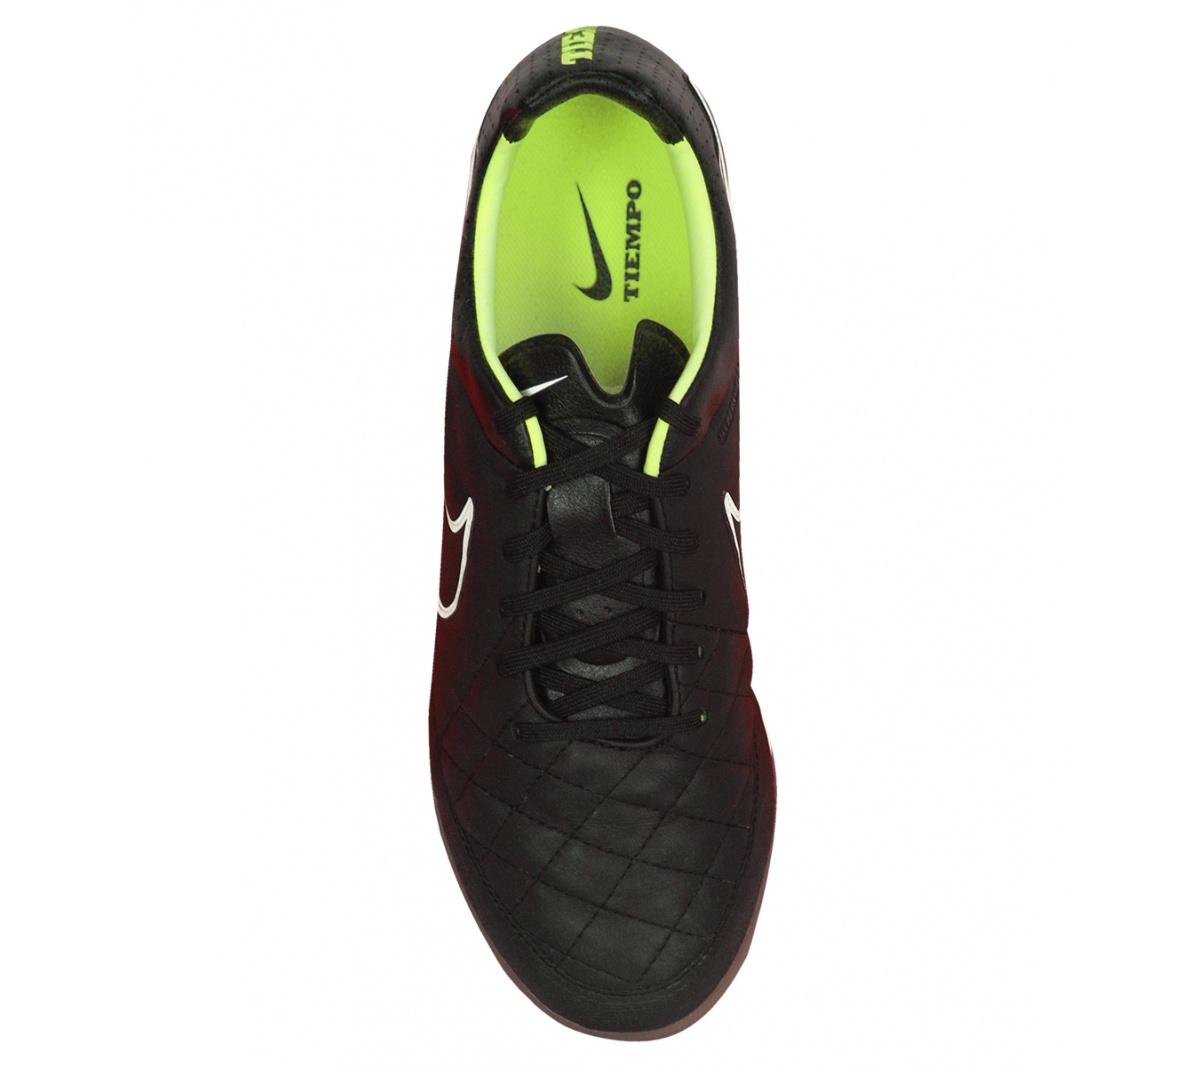 Chuteira Nike Tiempo Legacy Futsal - Mundo do Futebol b74068c31369f